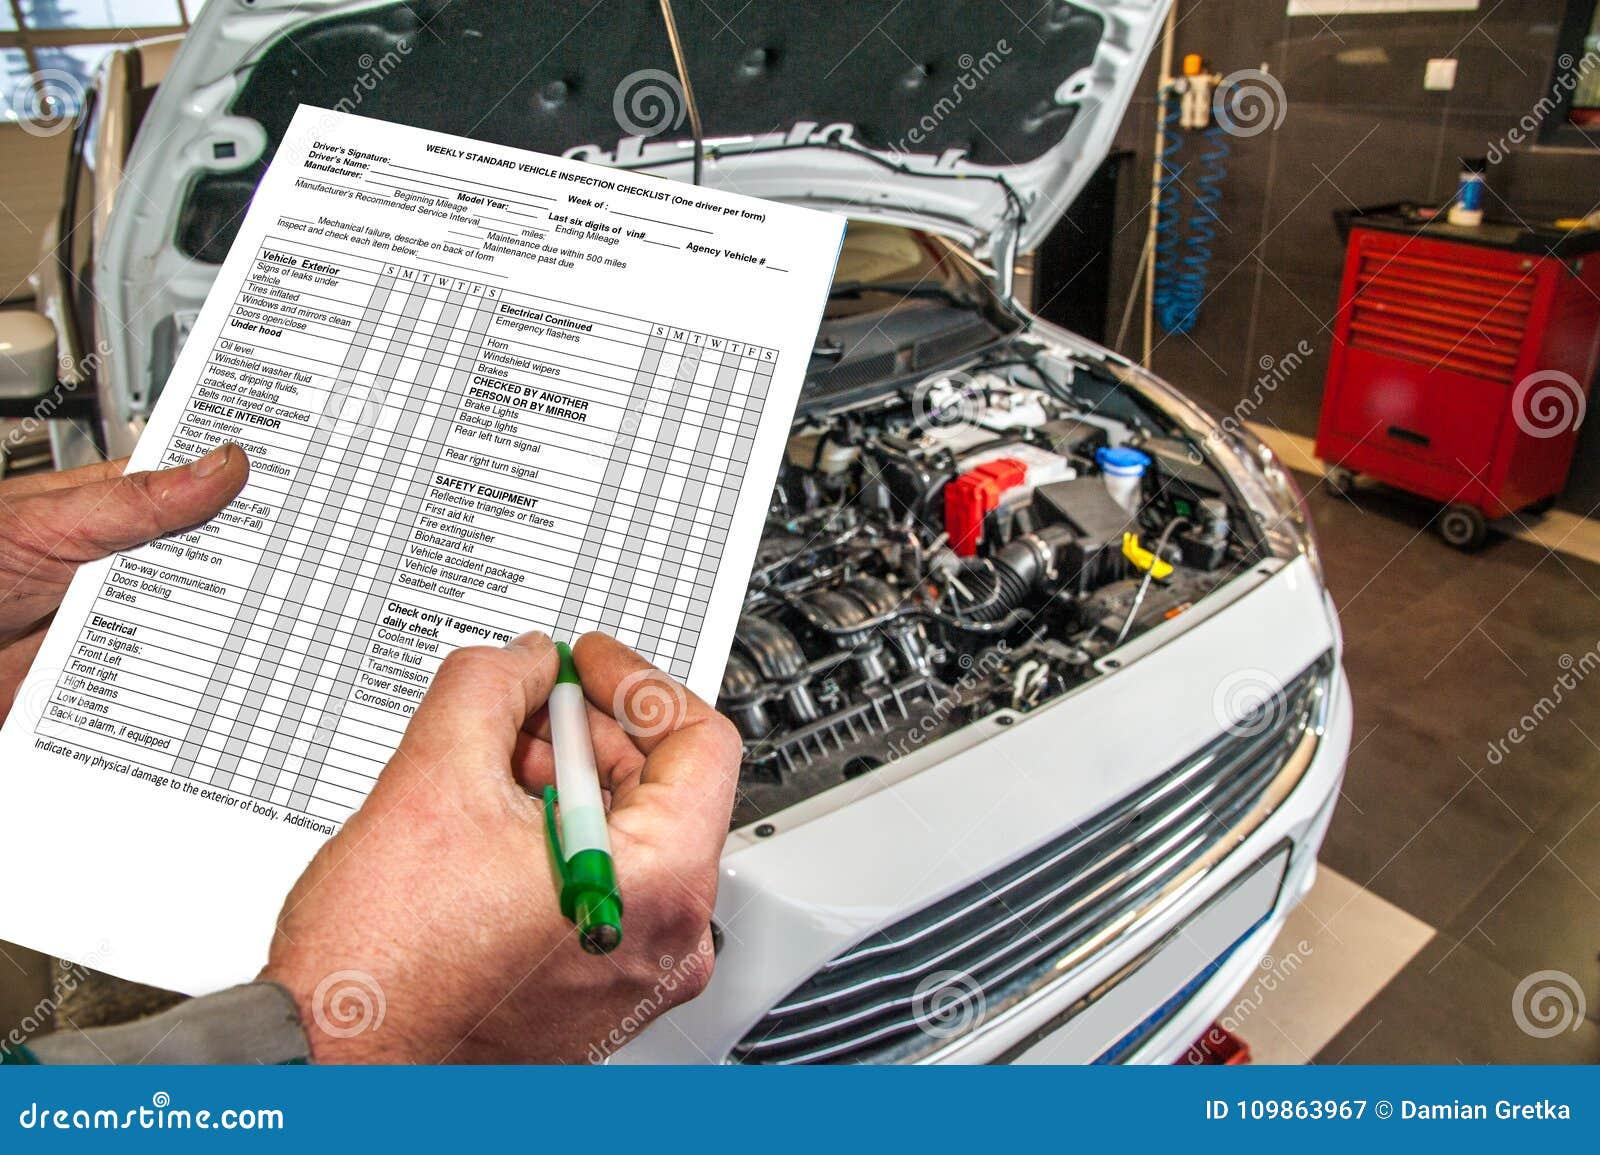 Free car diagnostic check